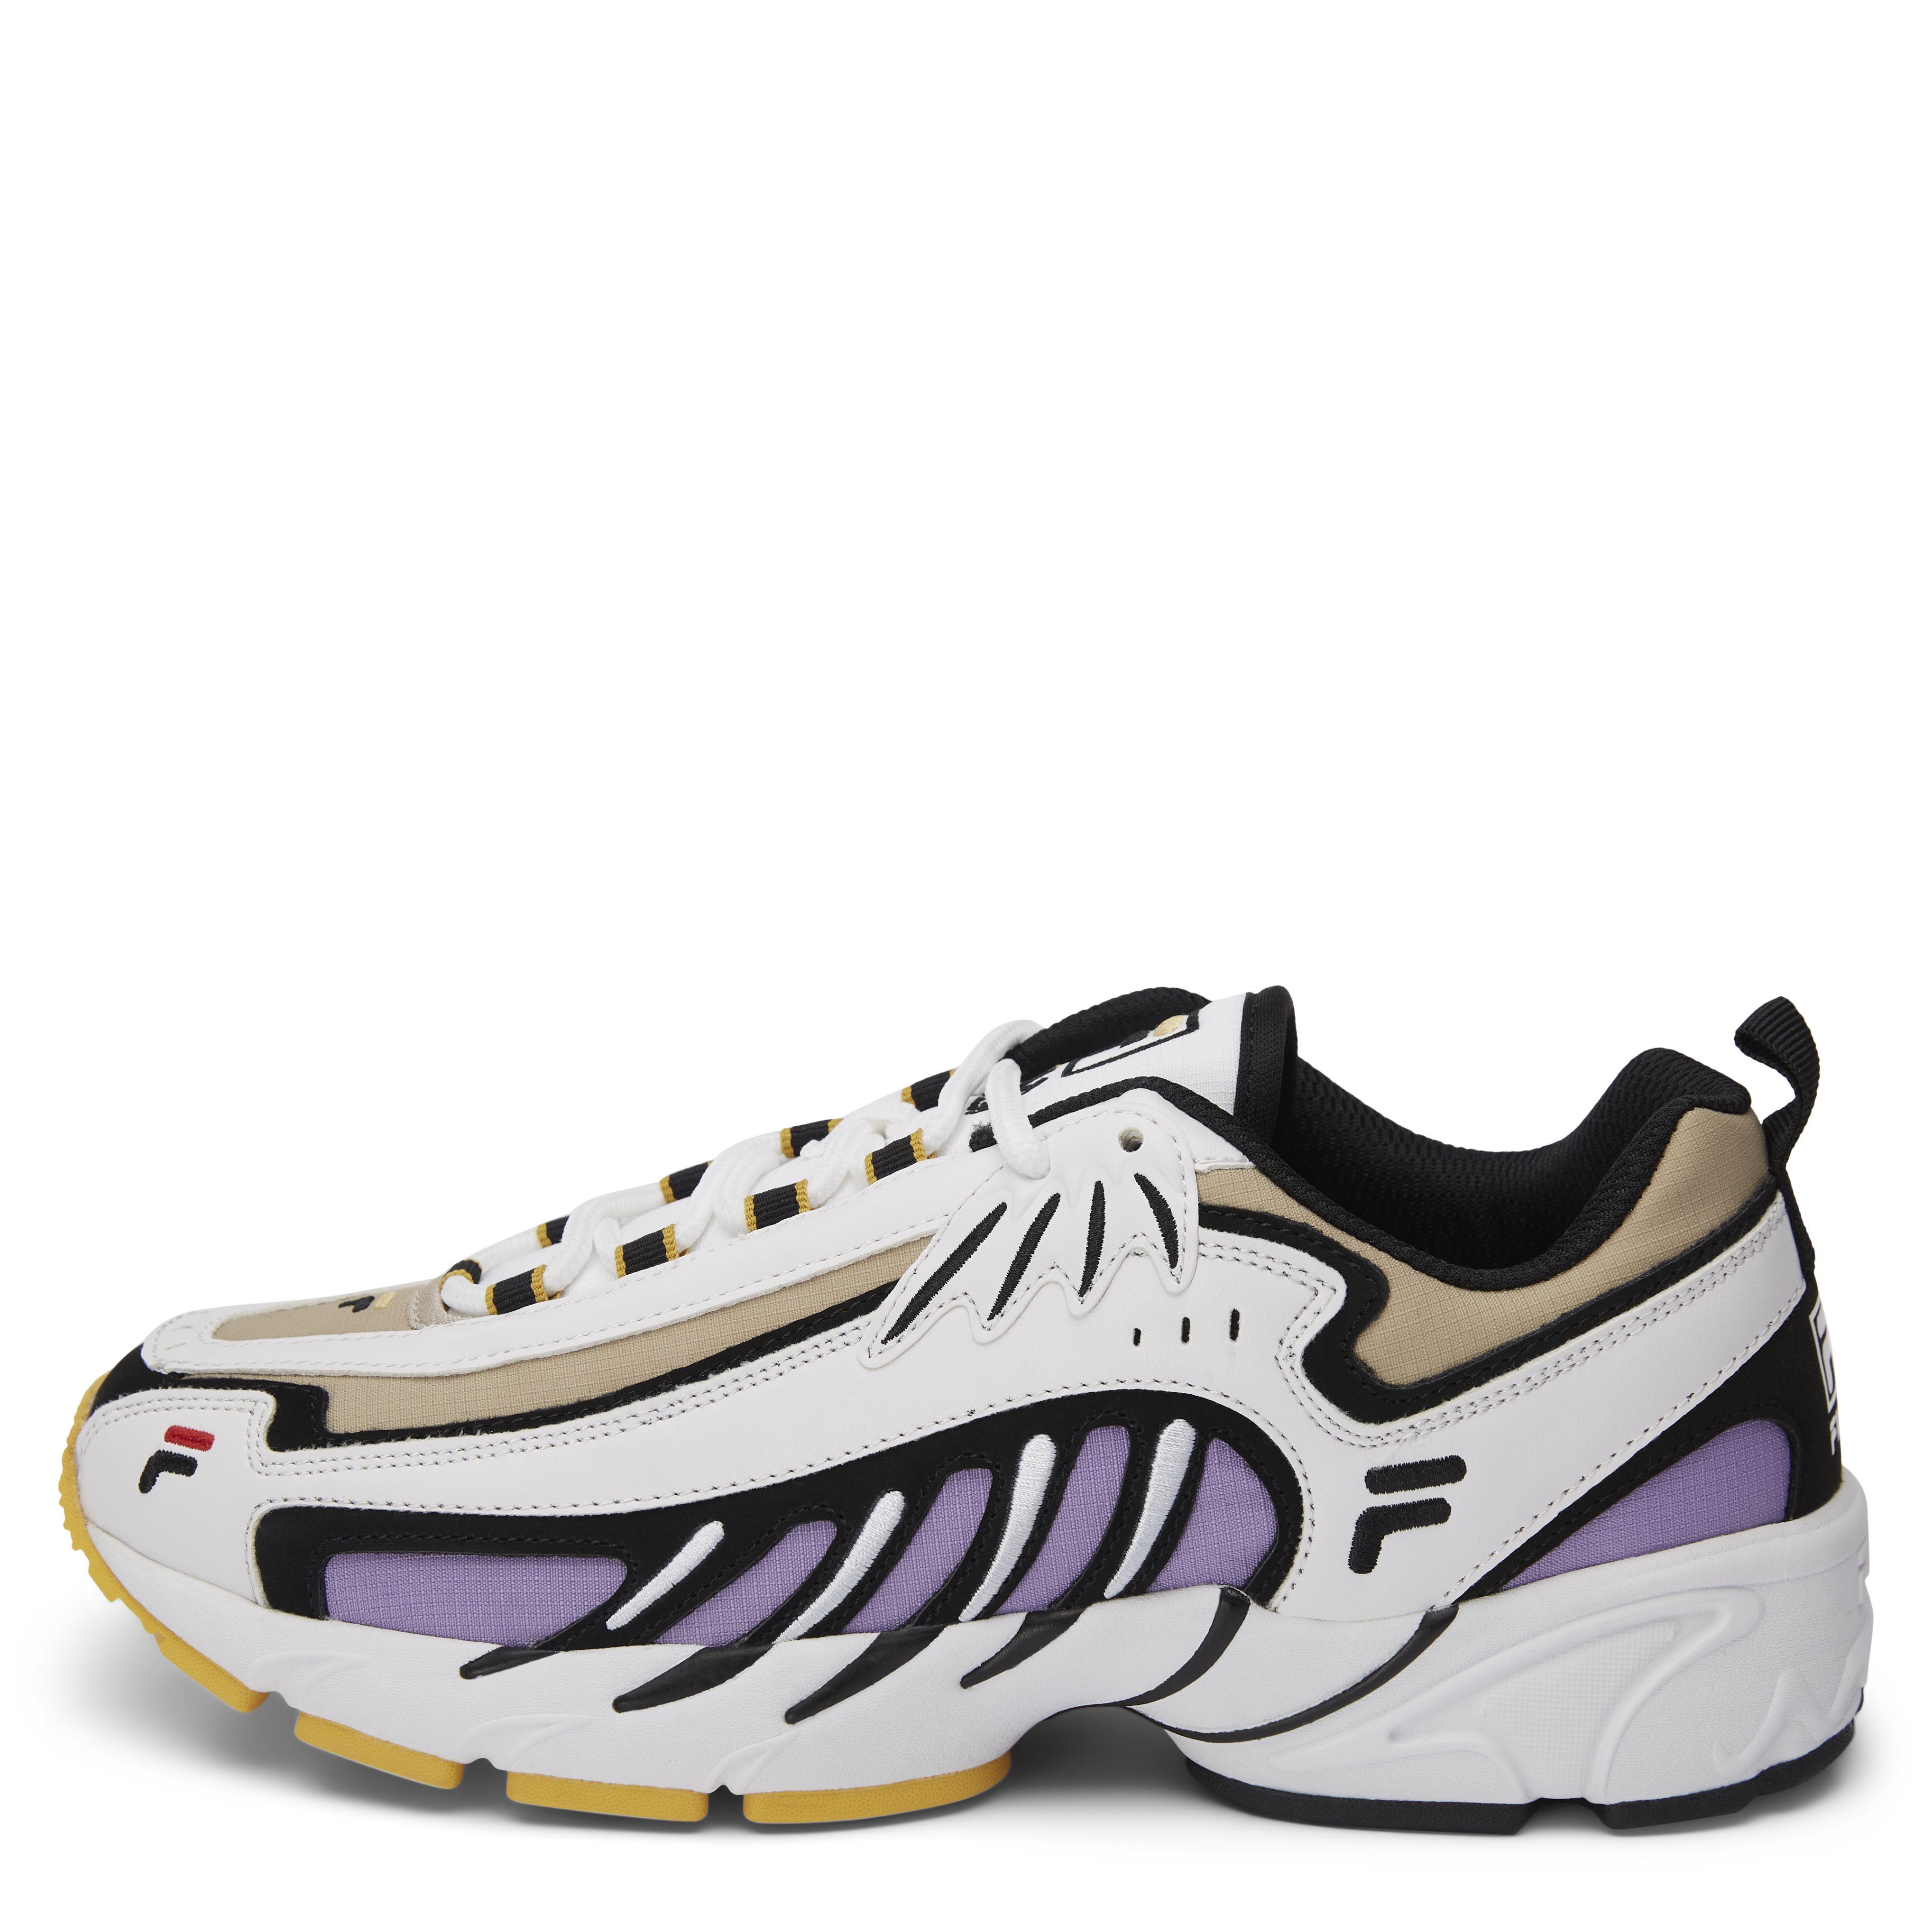 Adrenaline Low Sneaker - Shoes - White